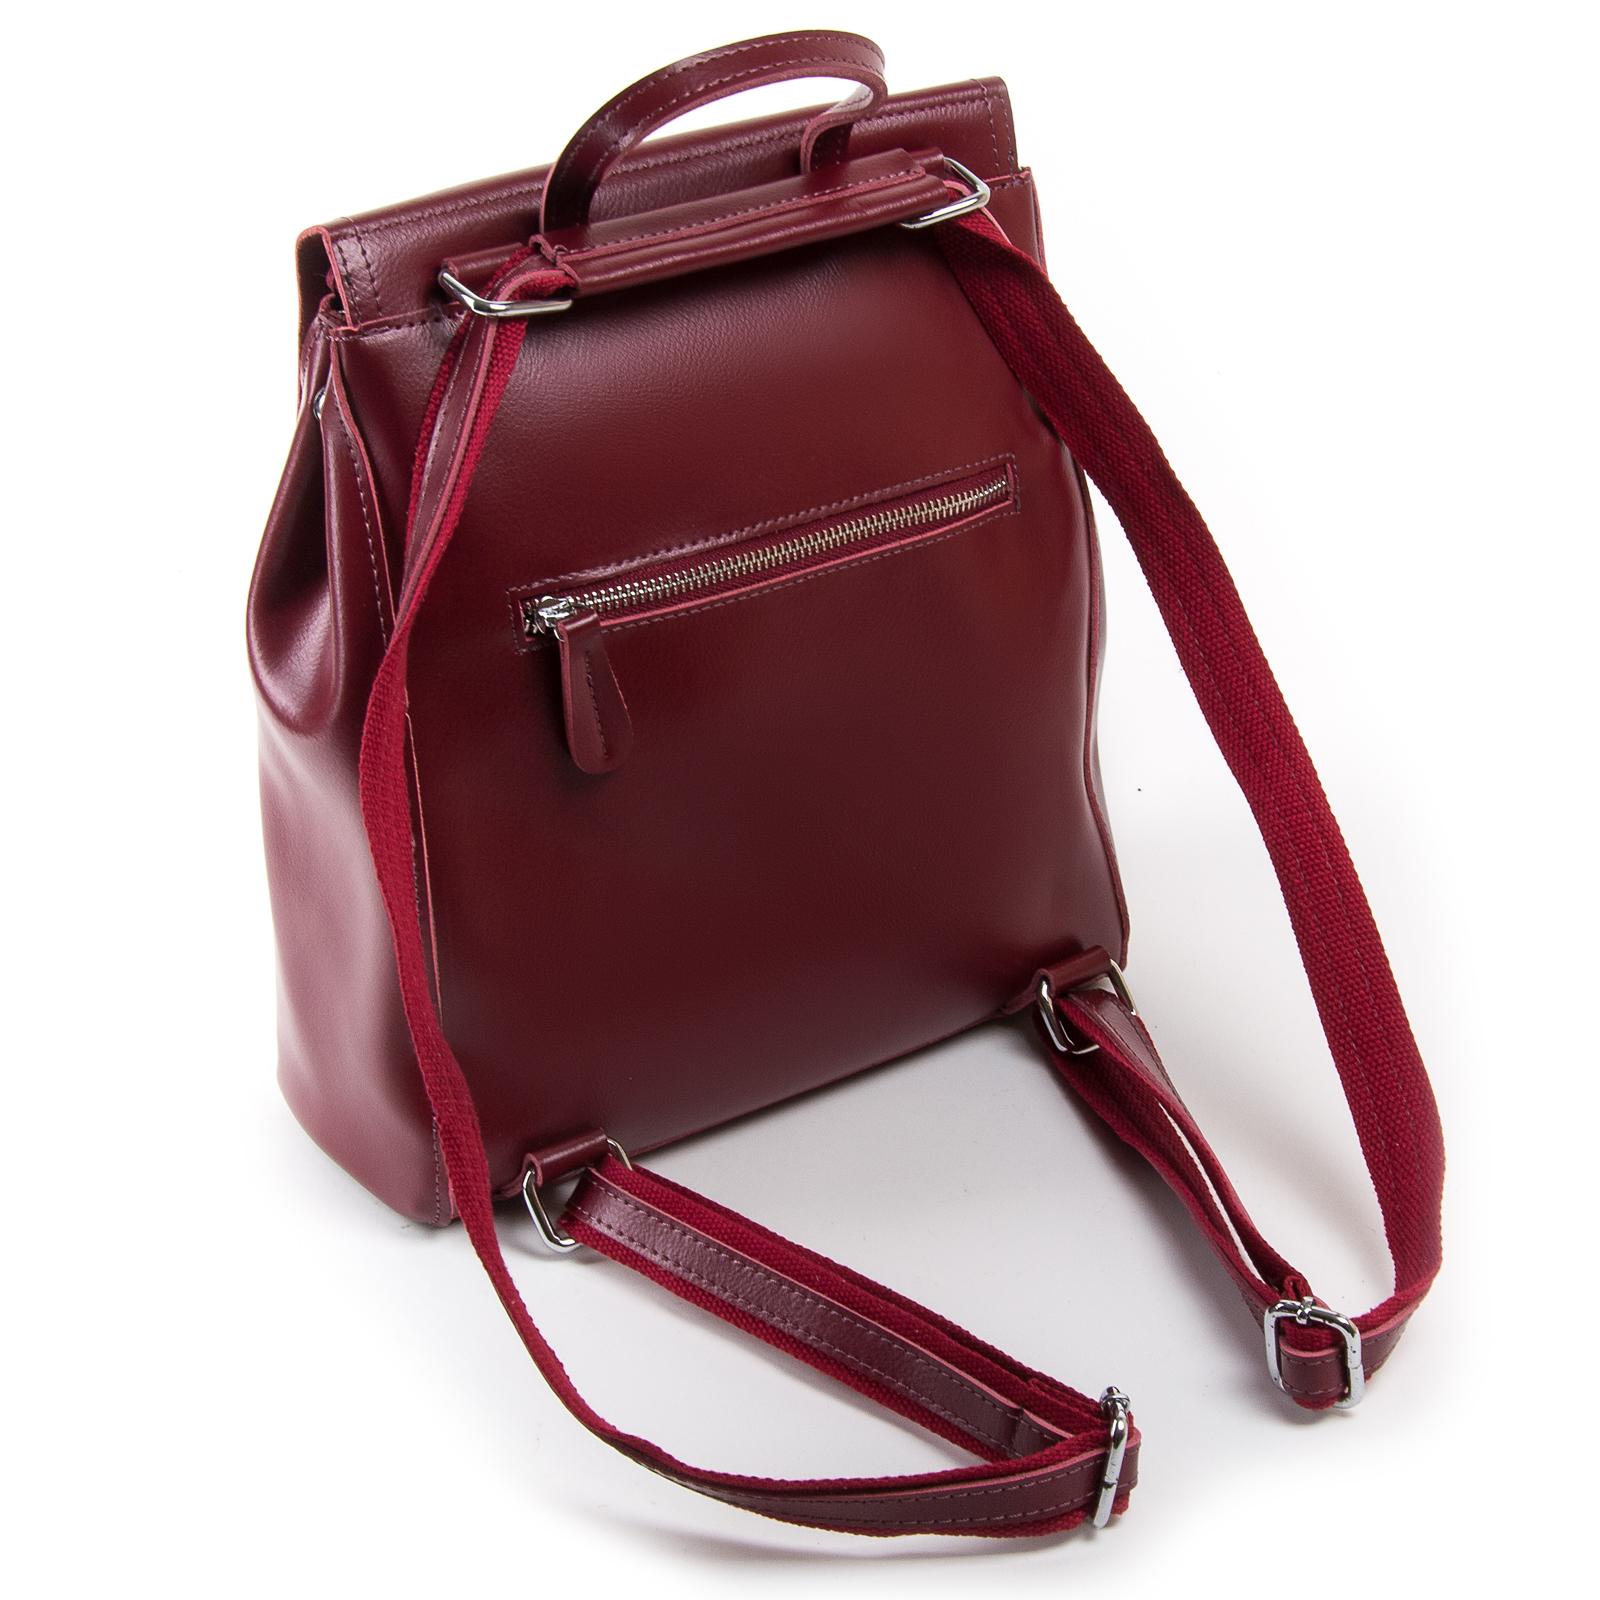 Сумка Женская Рюкзак кожа ALEX RAI 03-01 1005 light-red - фото 4